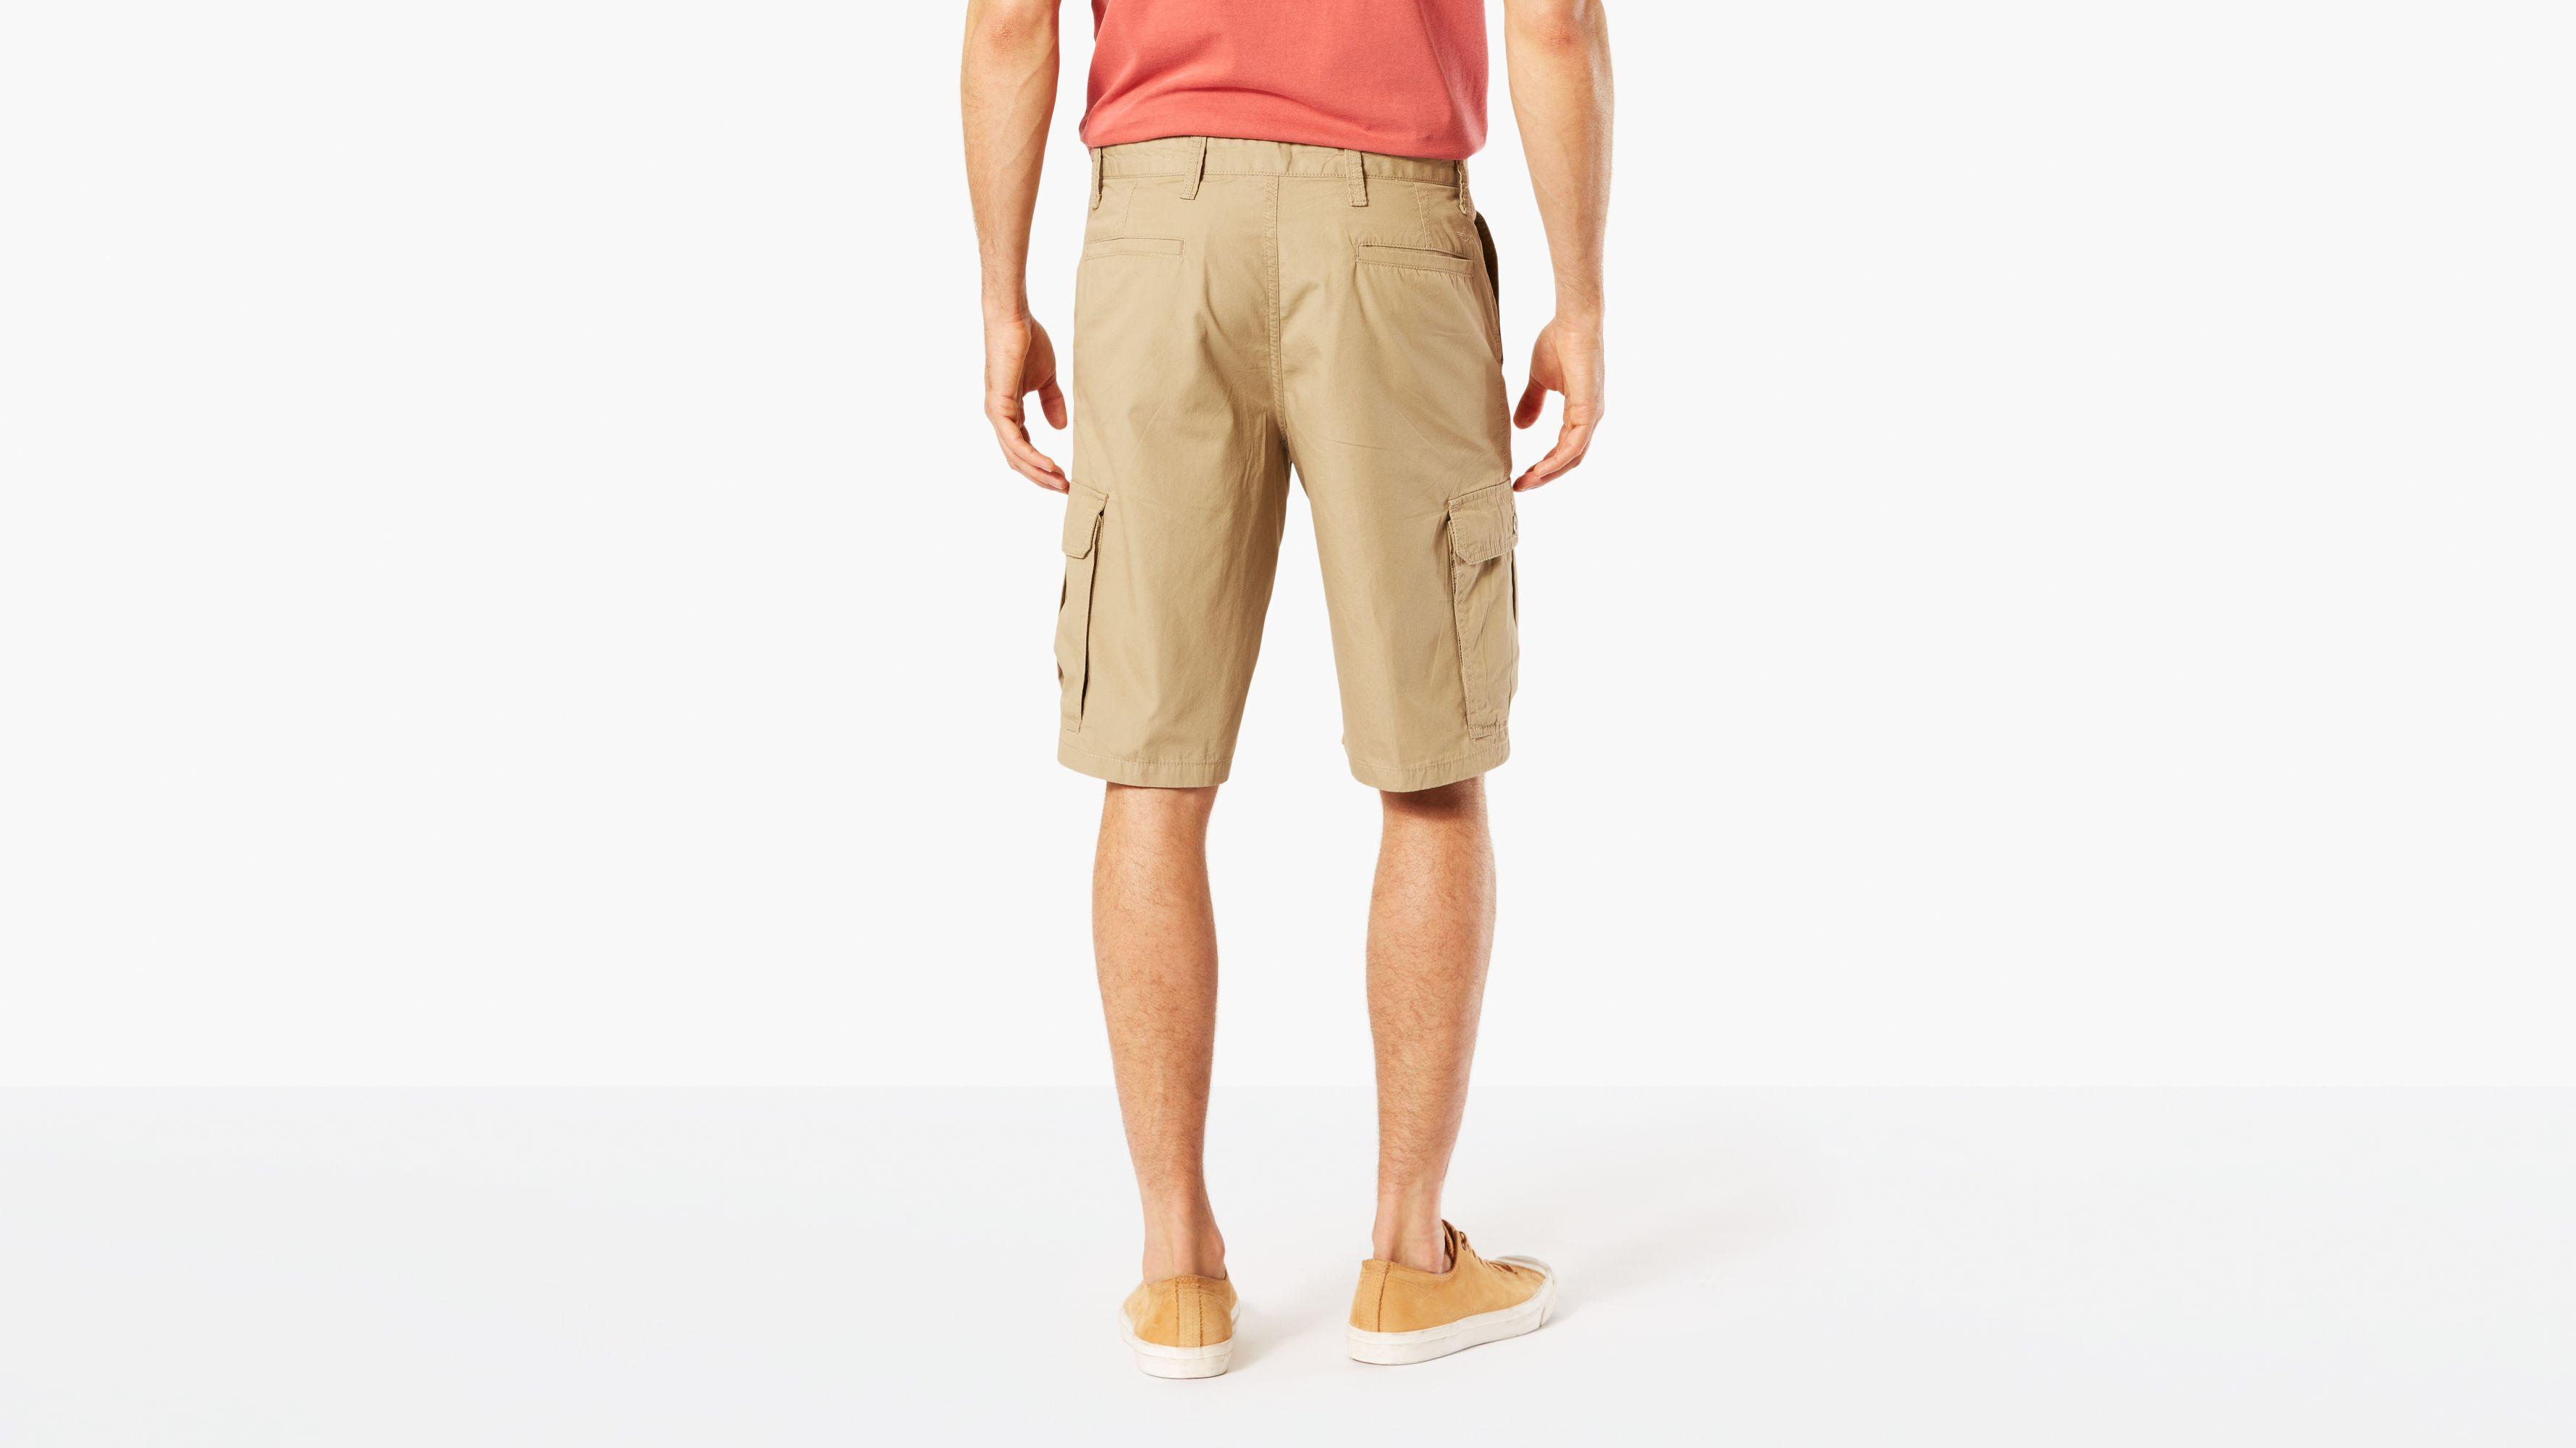 794e20365d Big & Tall Cargo Shorts - Tan 342650000 | Dockers® US